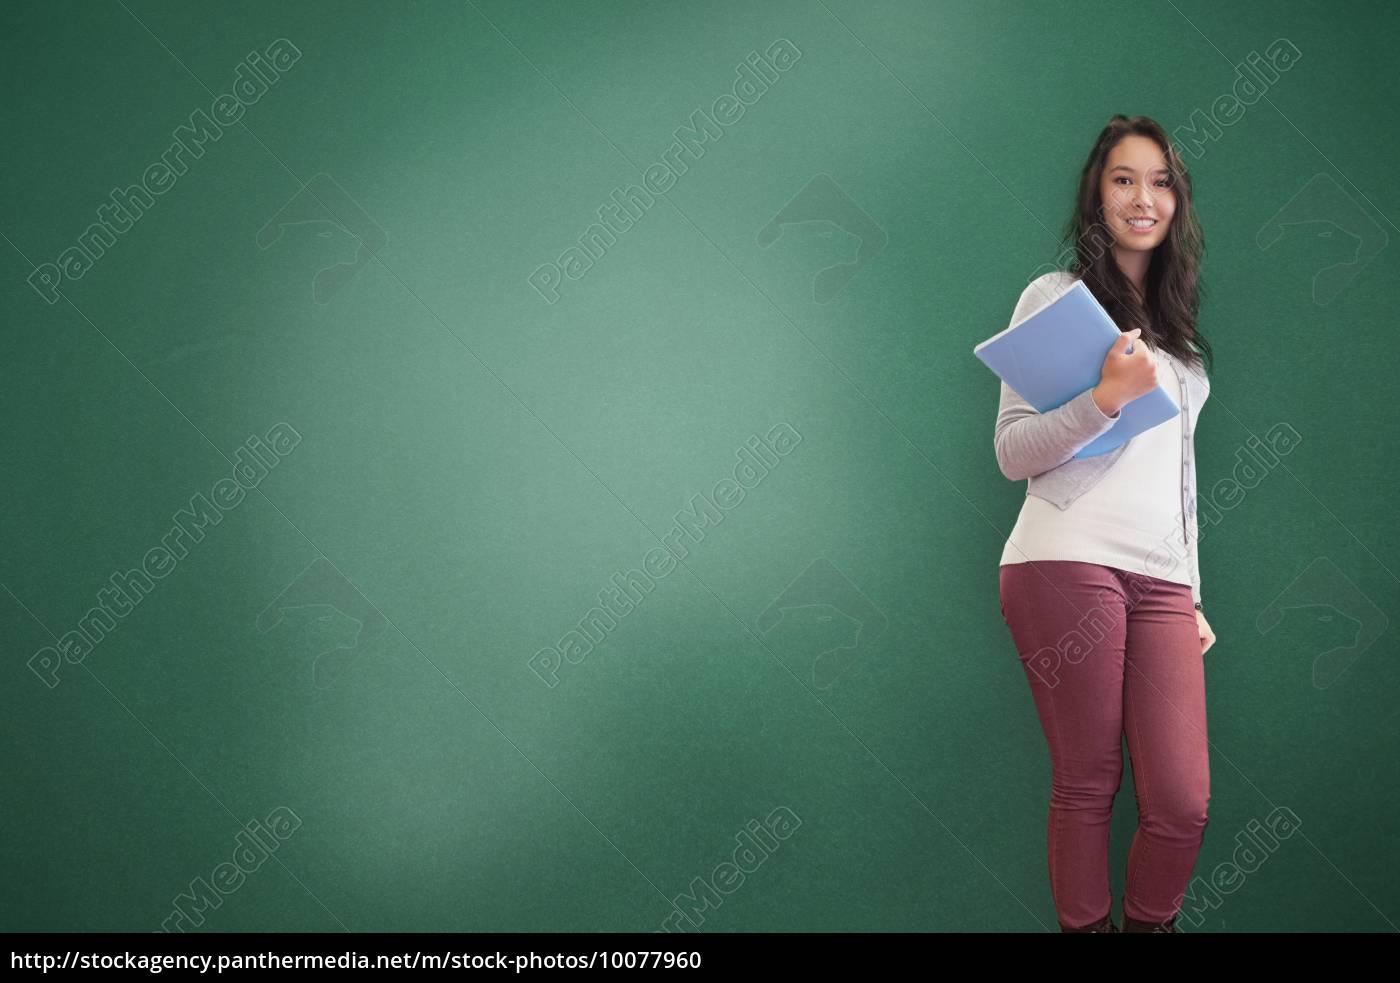 smiling, brunette, holding, notebook, posing - 10077960